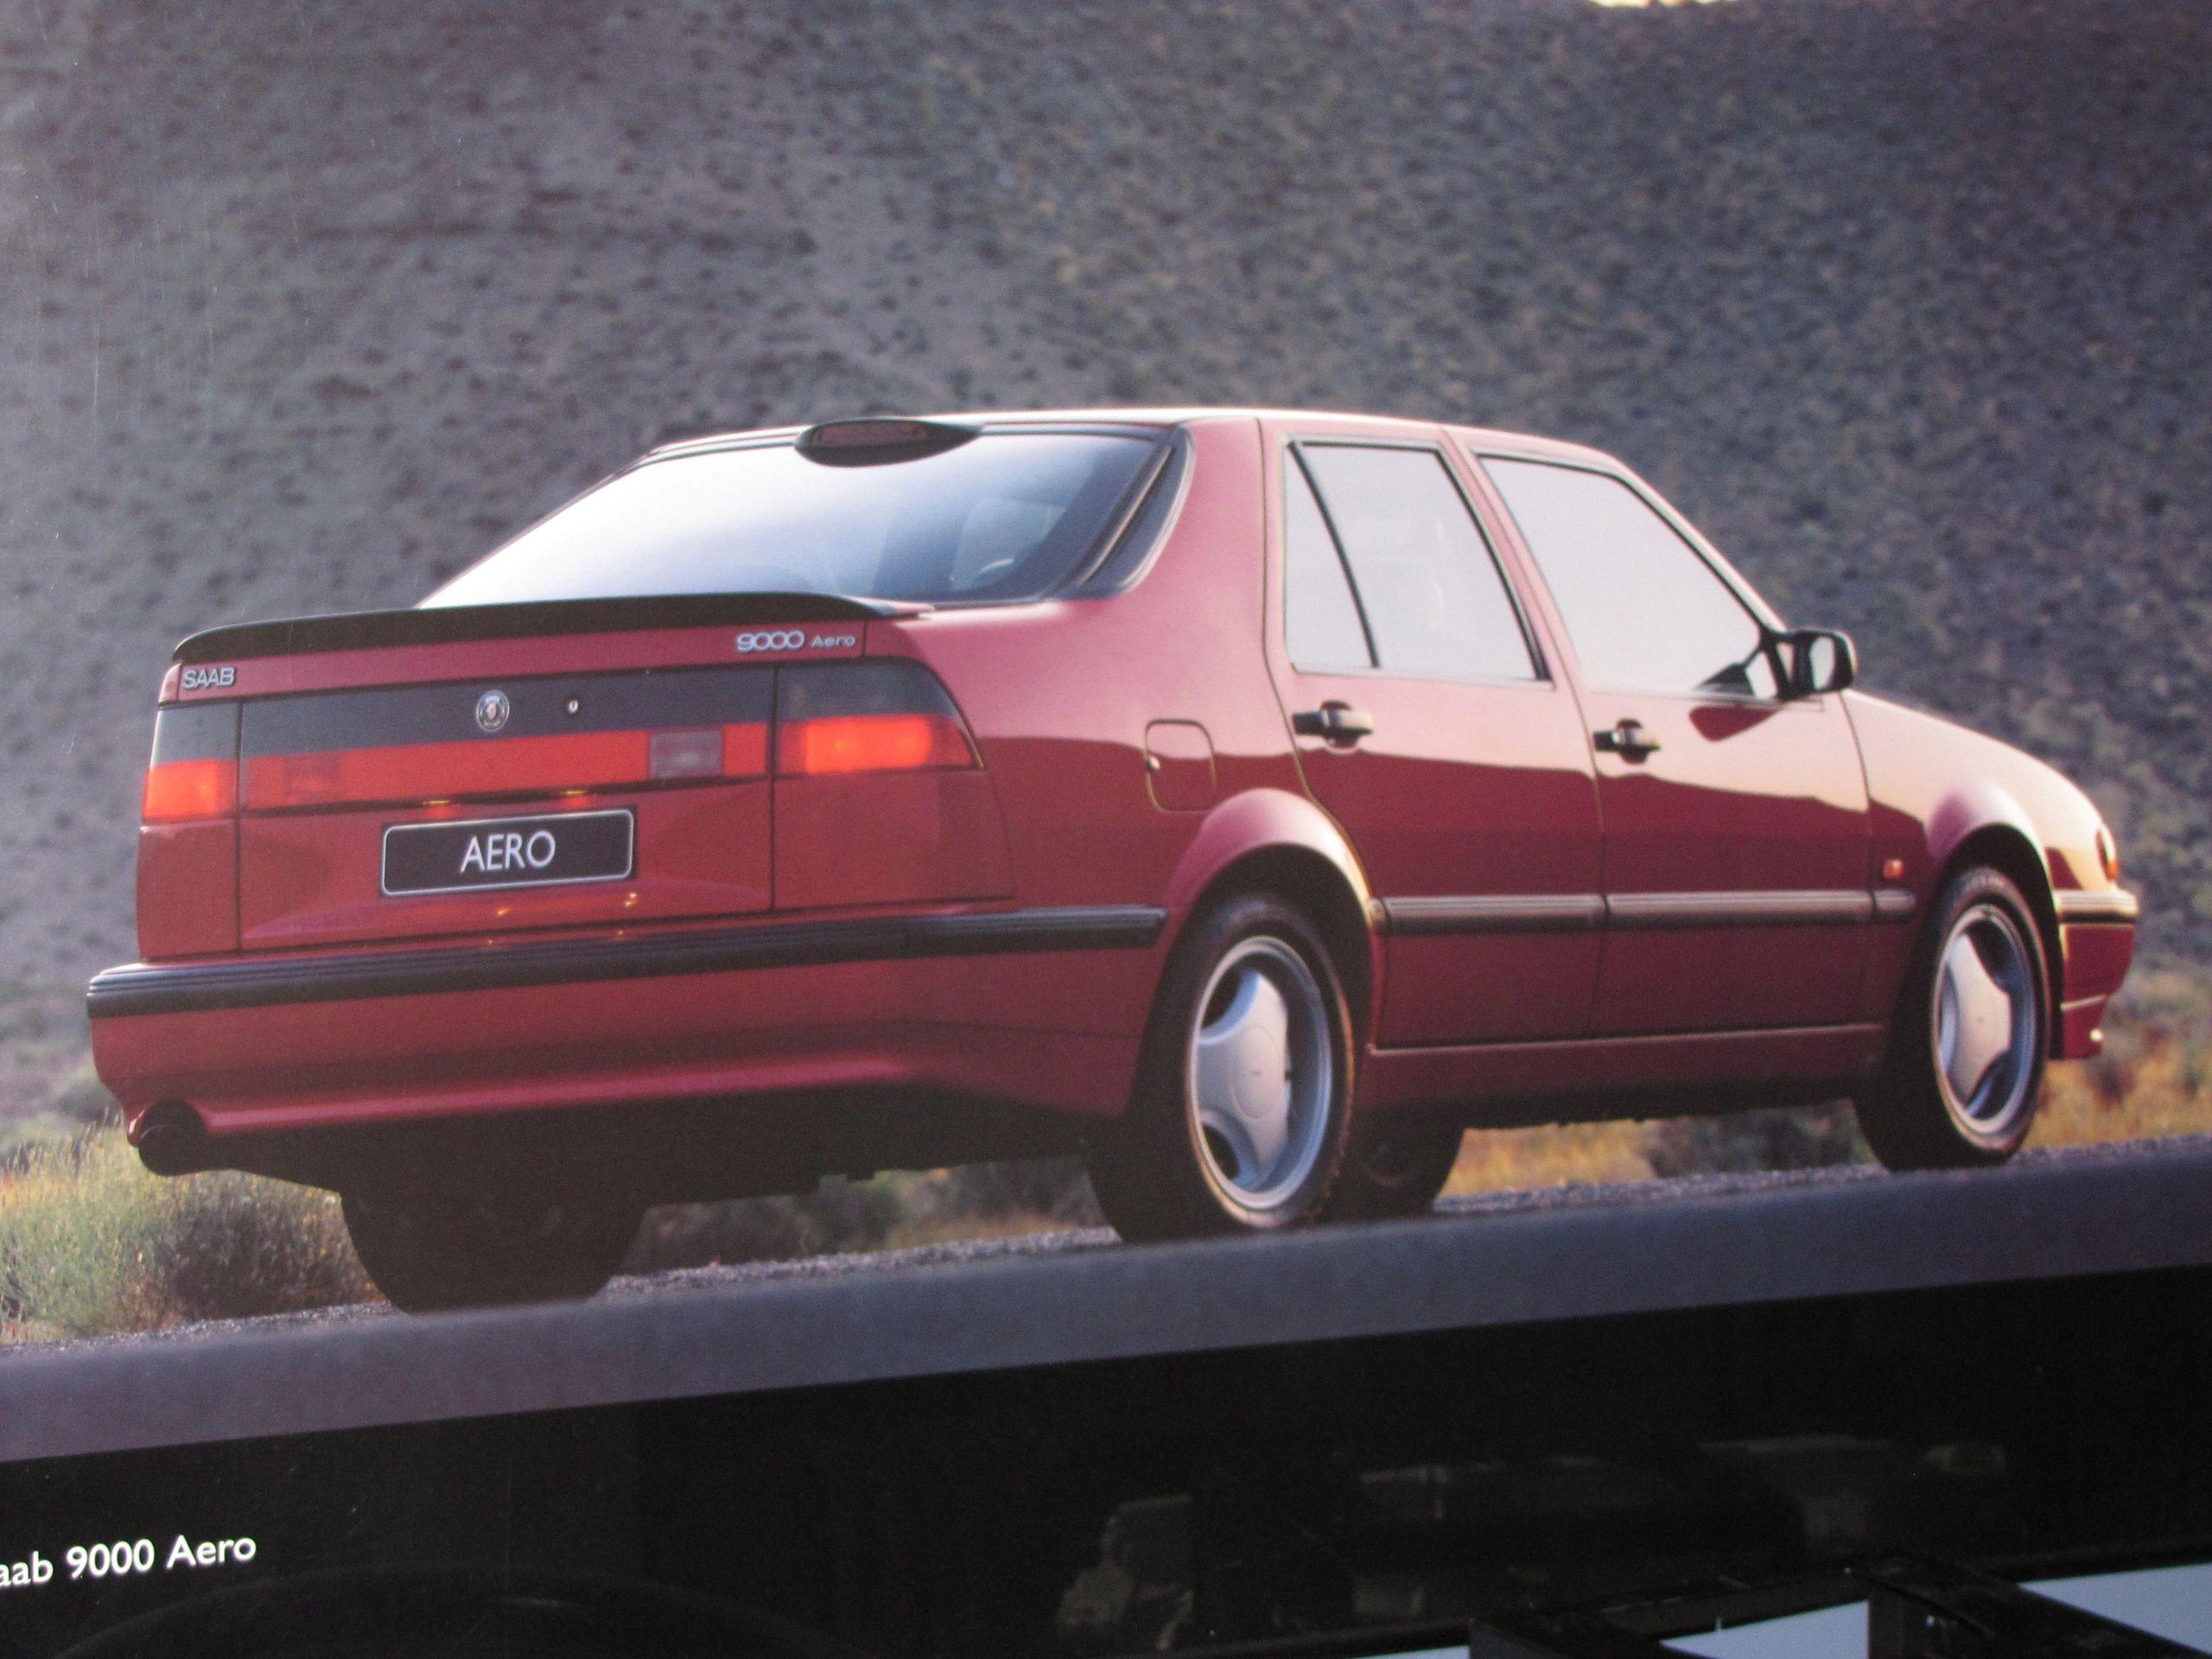 Redaero Saab Parts - online   Redaero Saab Parts